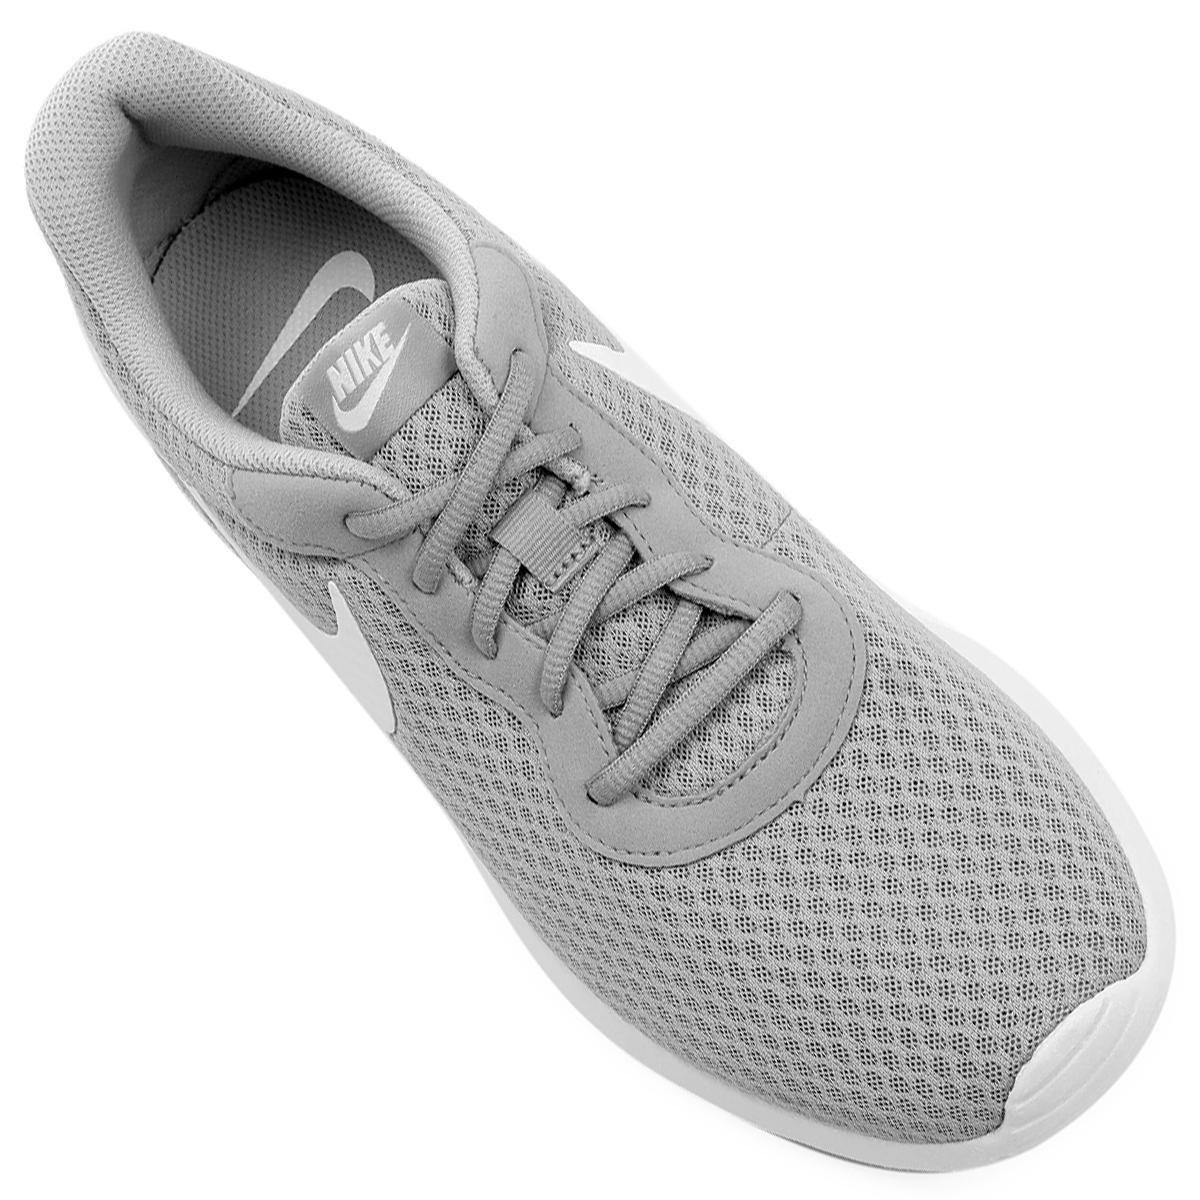 Tênis Nike Tanjun Masculino - Cinza e Branco - Compre Agora  b6d95a52afa35